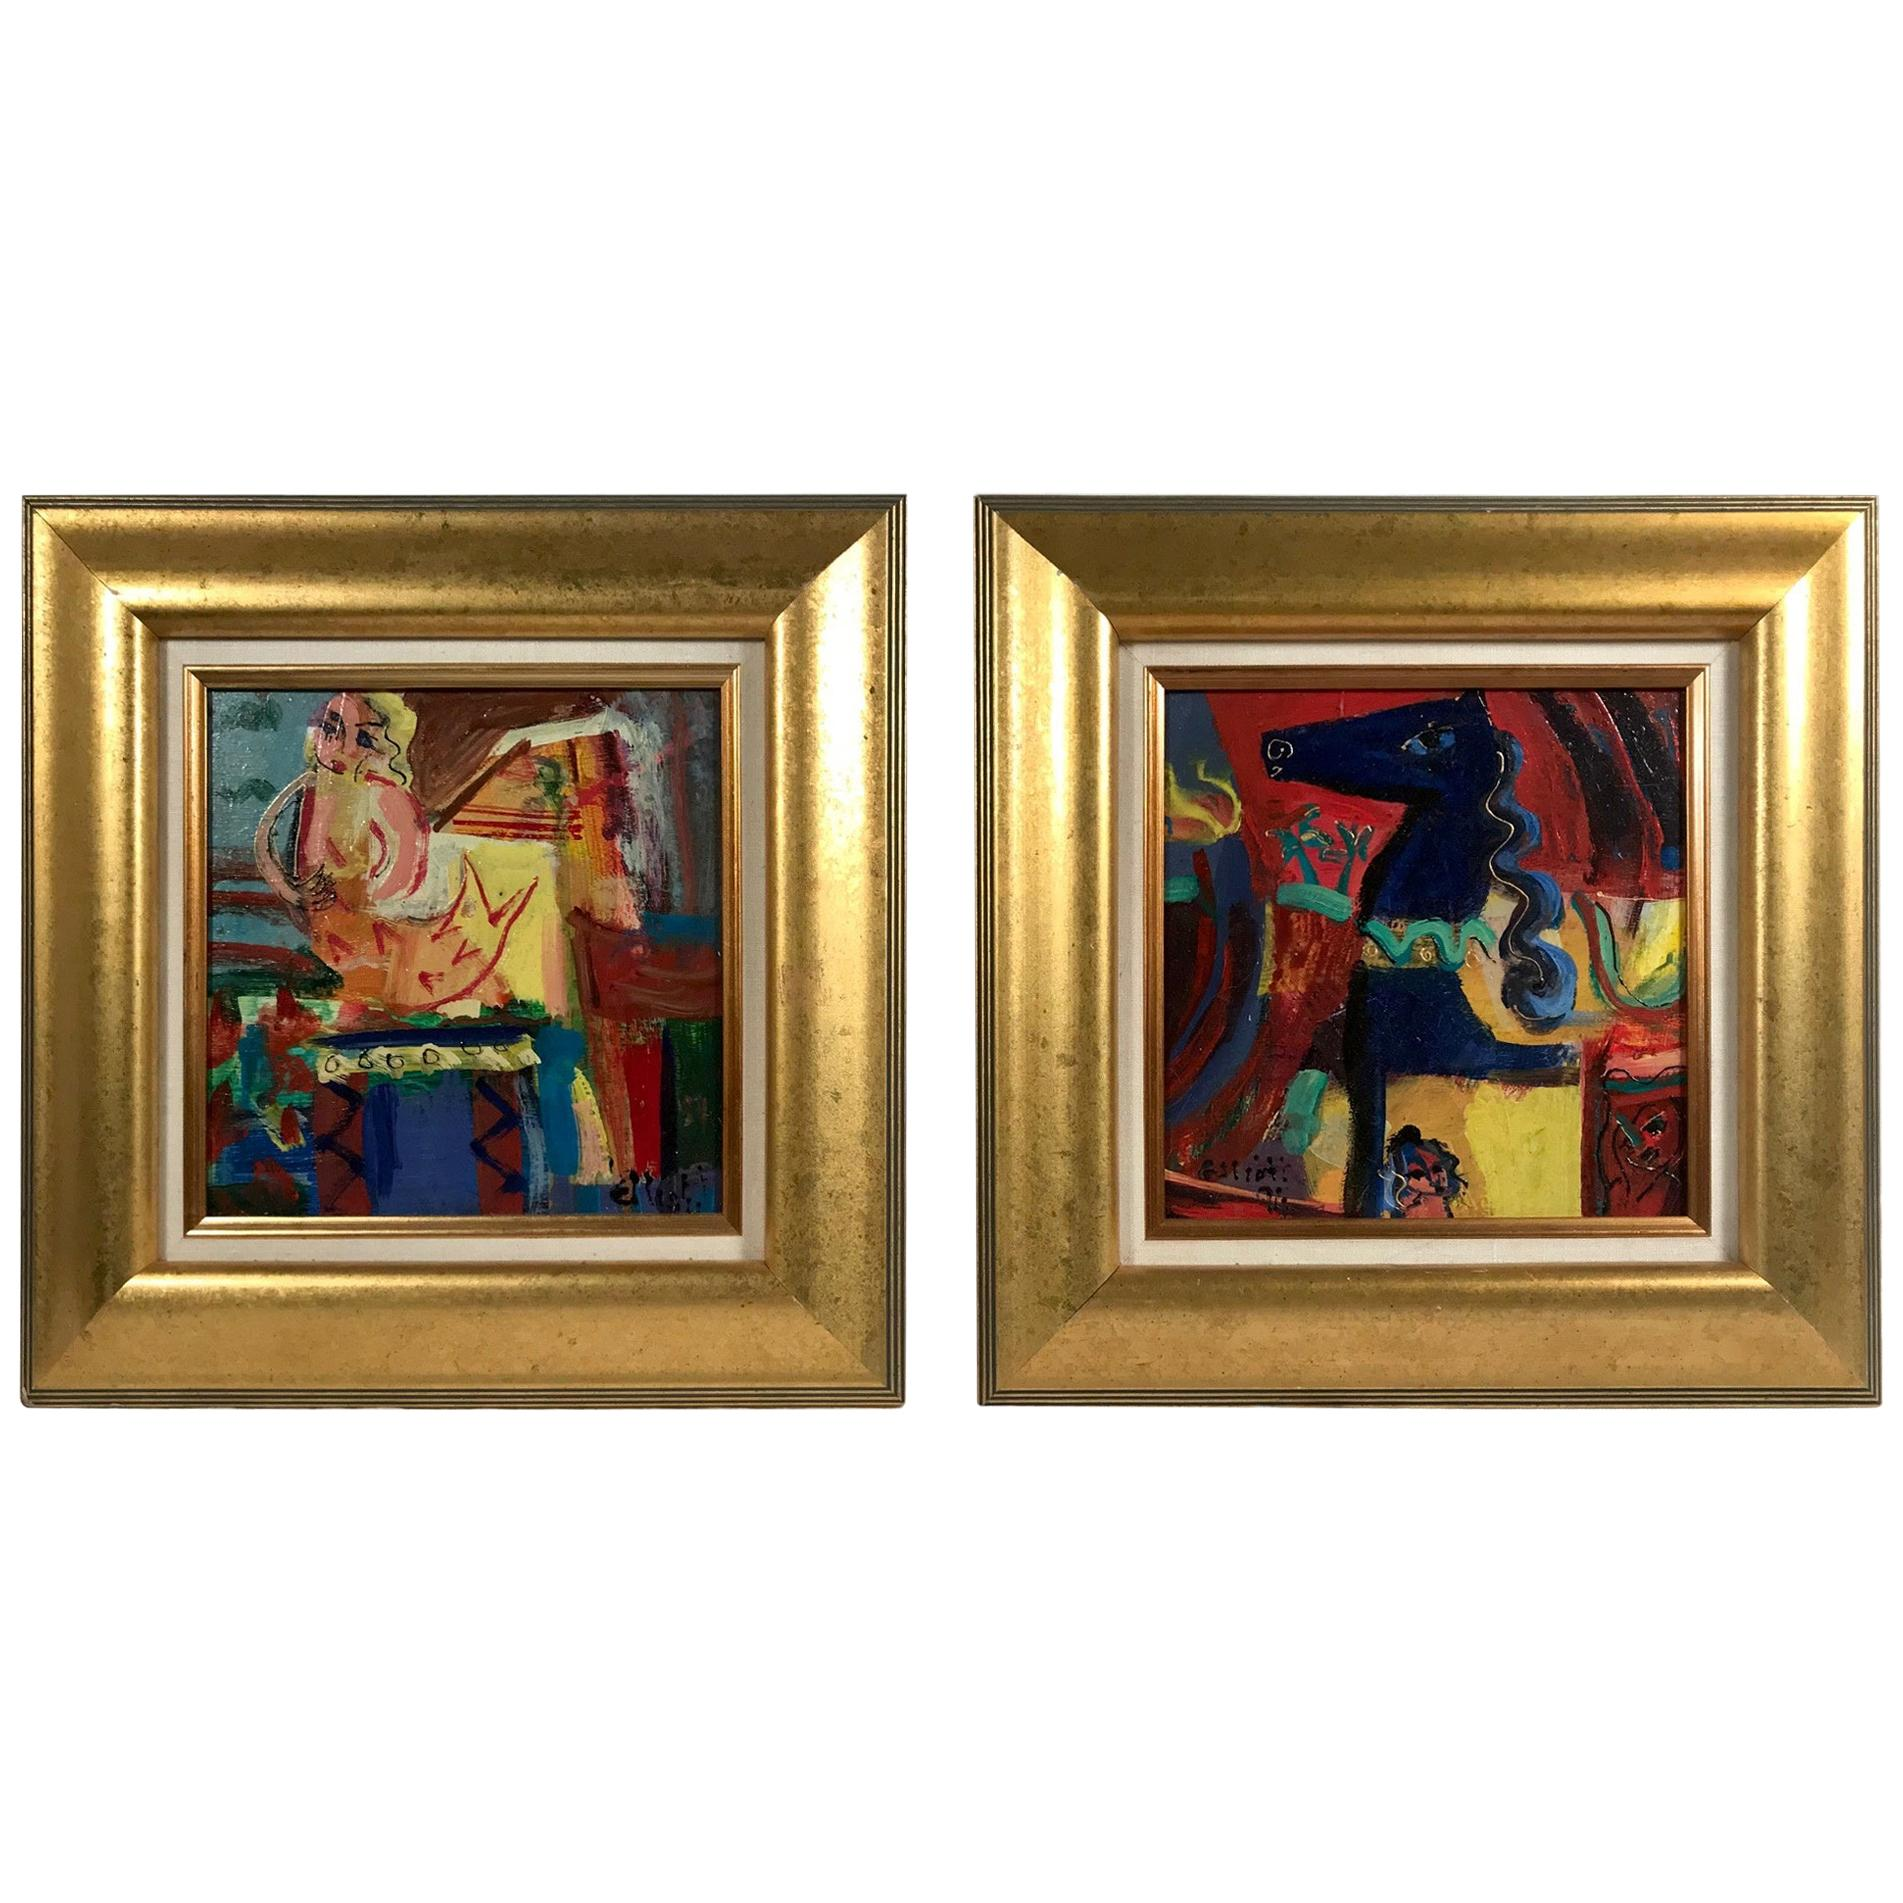 Pair of Original Paintings, Expressionist Surrealist Oil on Wood Panel, Signed